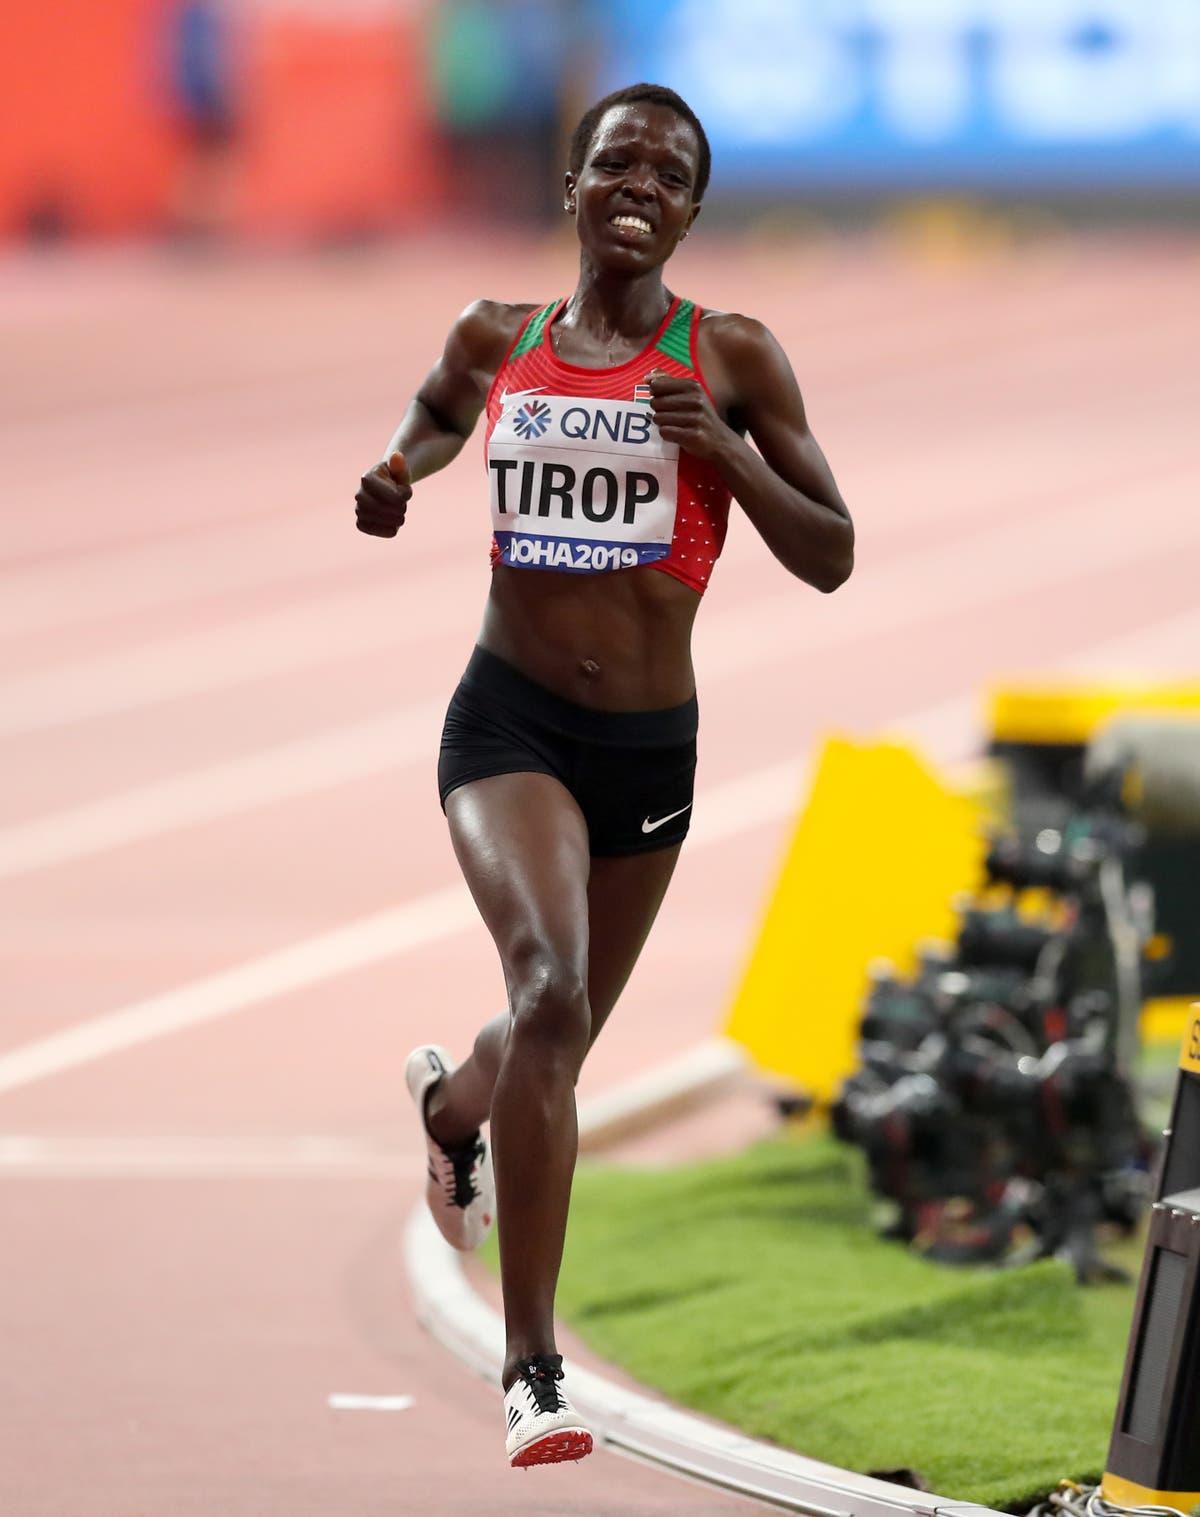 Husband of Agnes Tirop arrested following long-distance runner's death